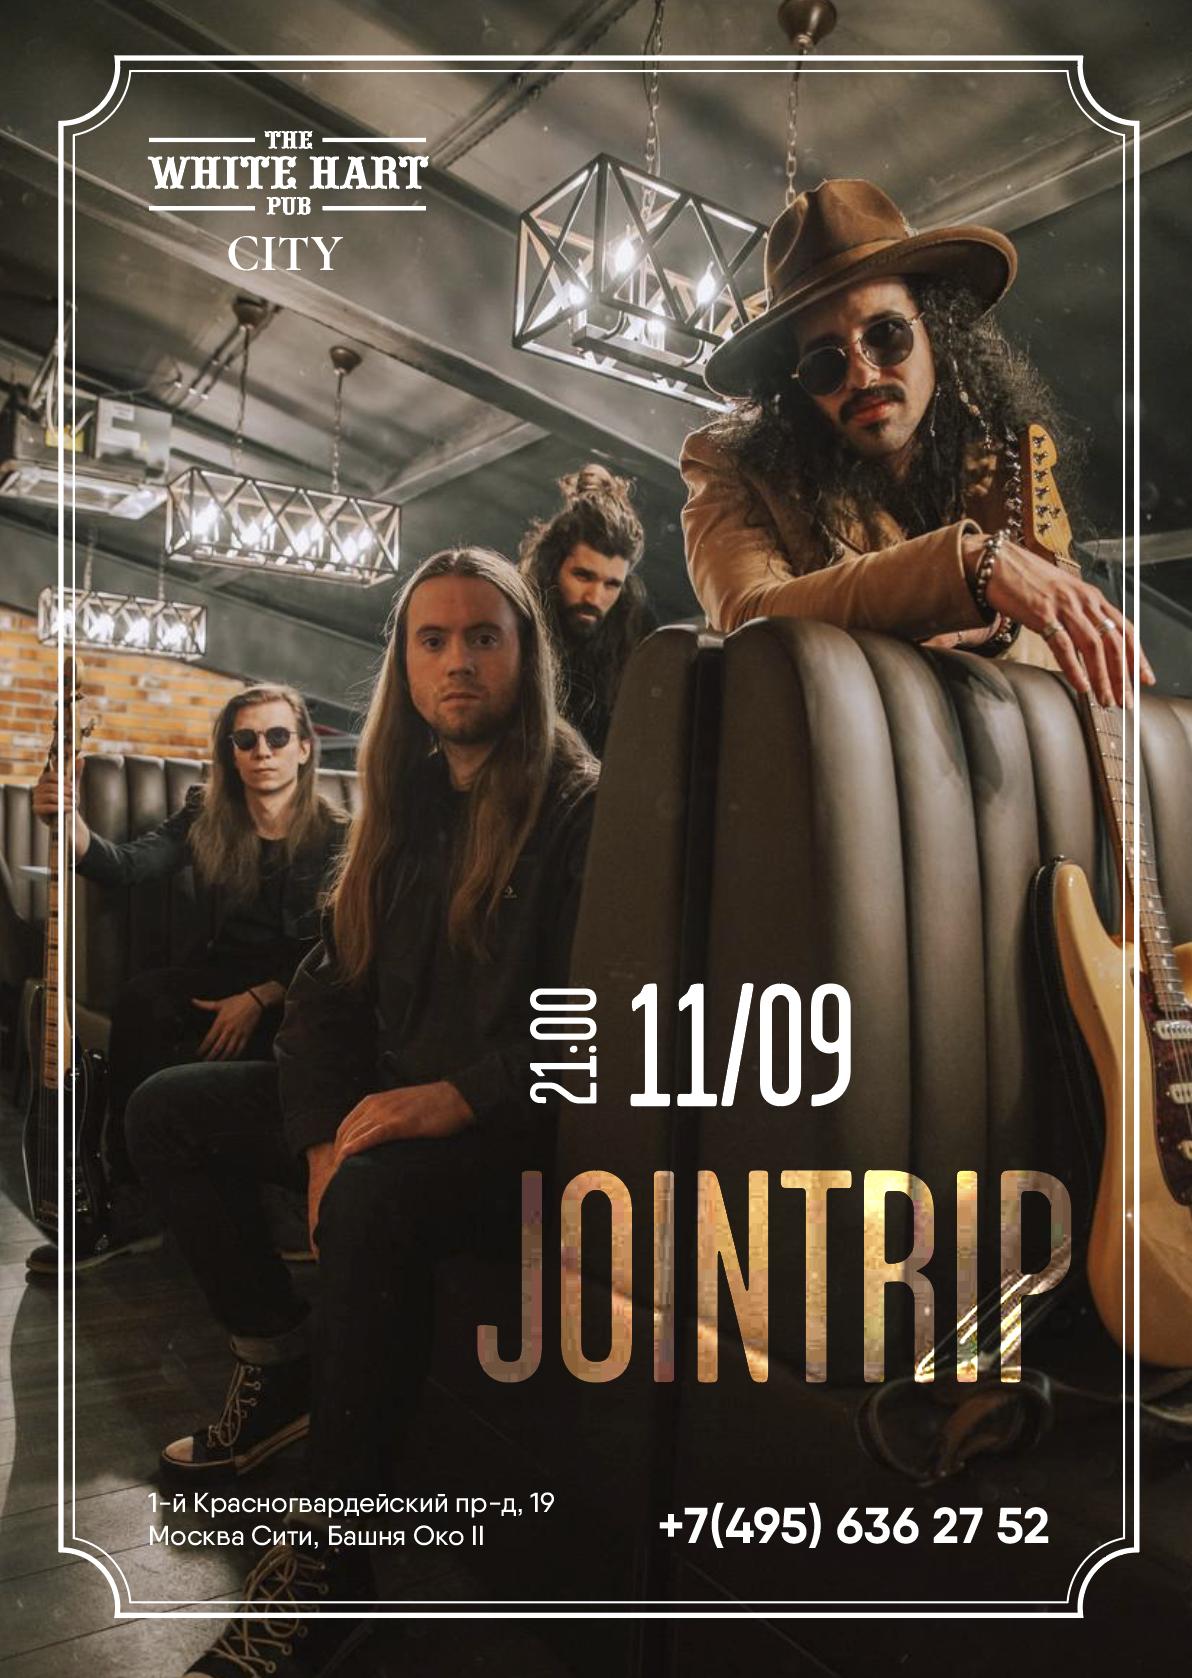 Афиша! 11.09 — Кавер группа JoinTrip в White Hart Pub Moscow City